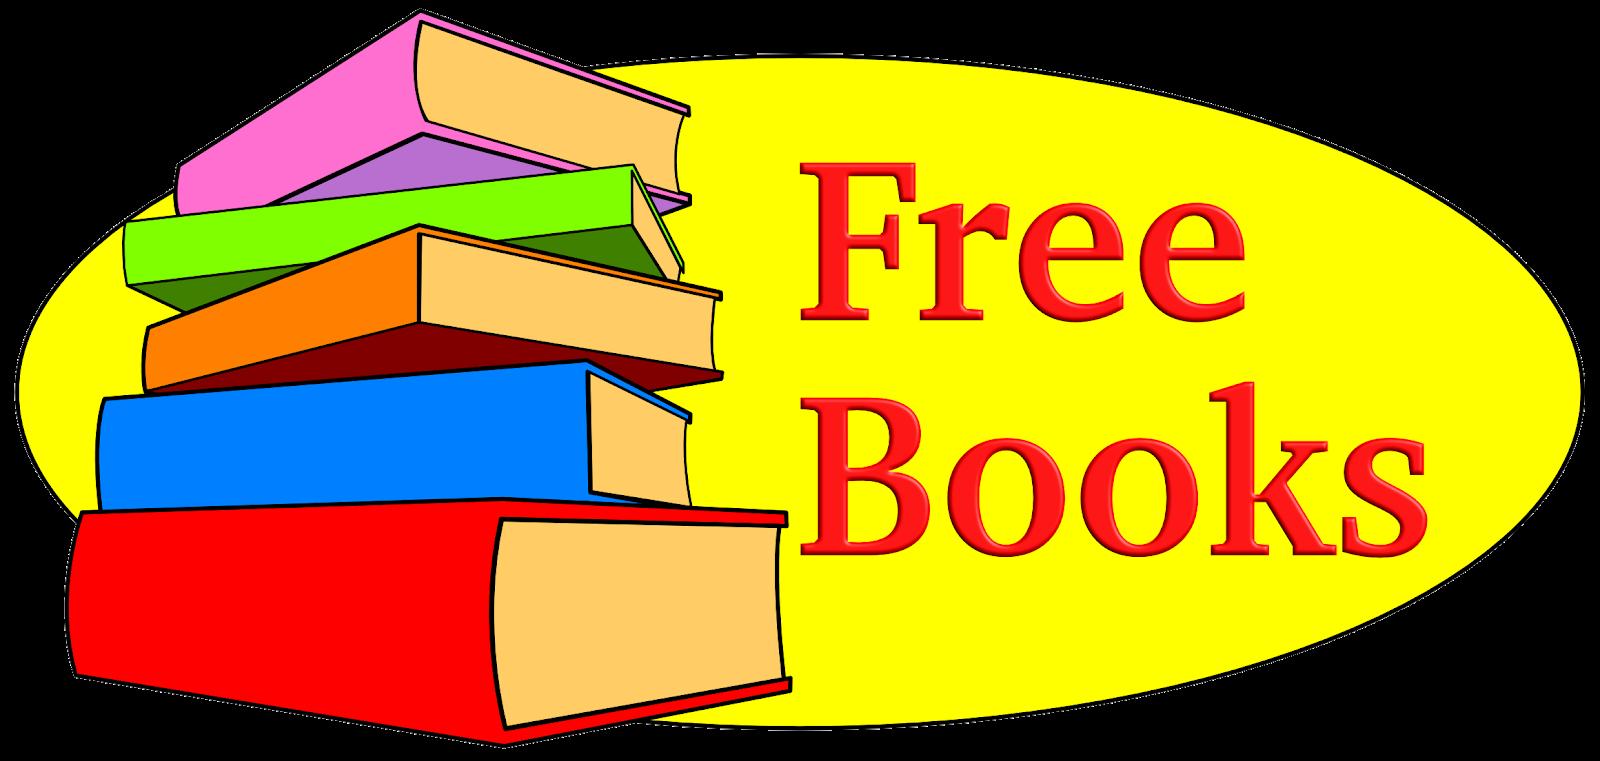 Request Free Books